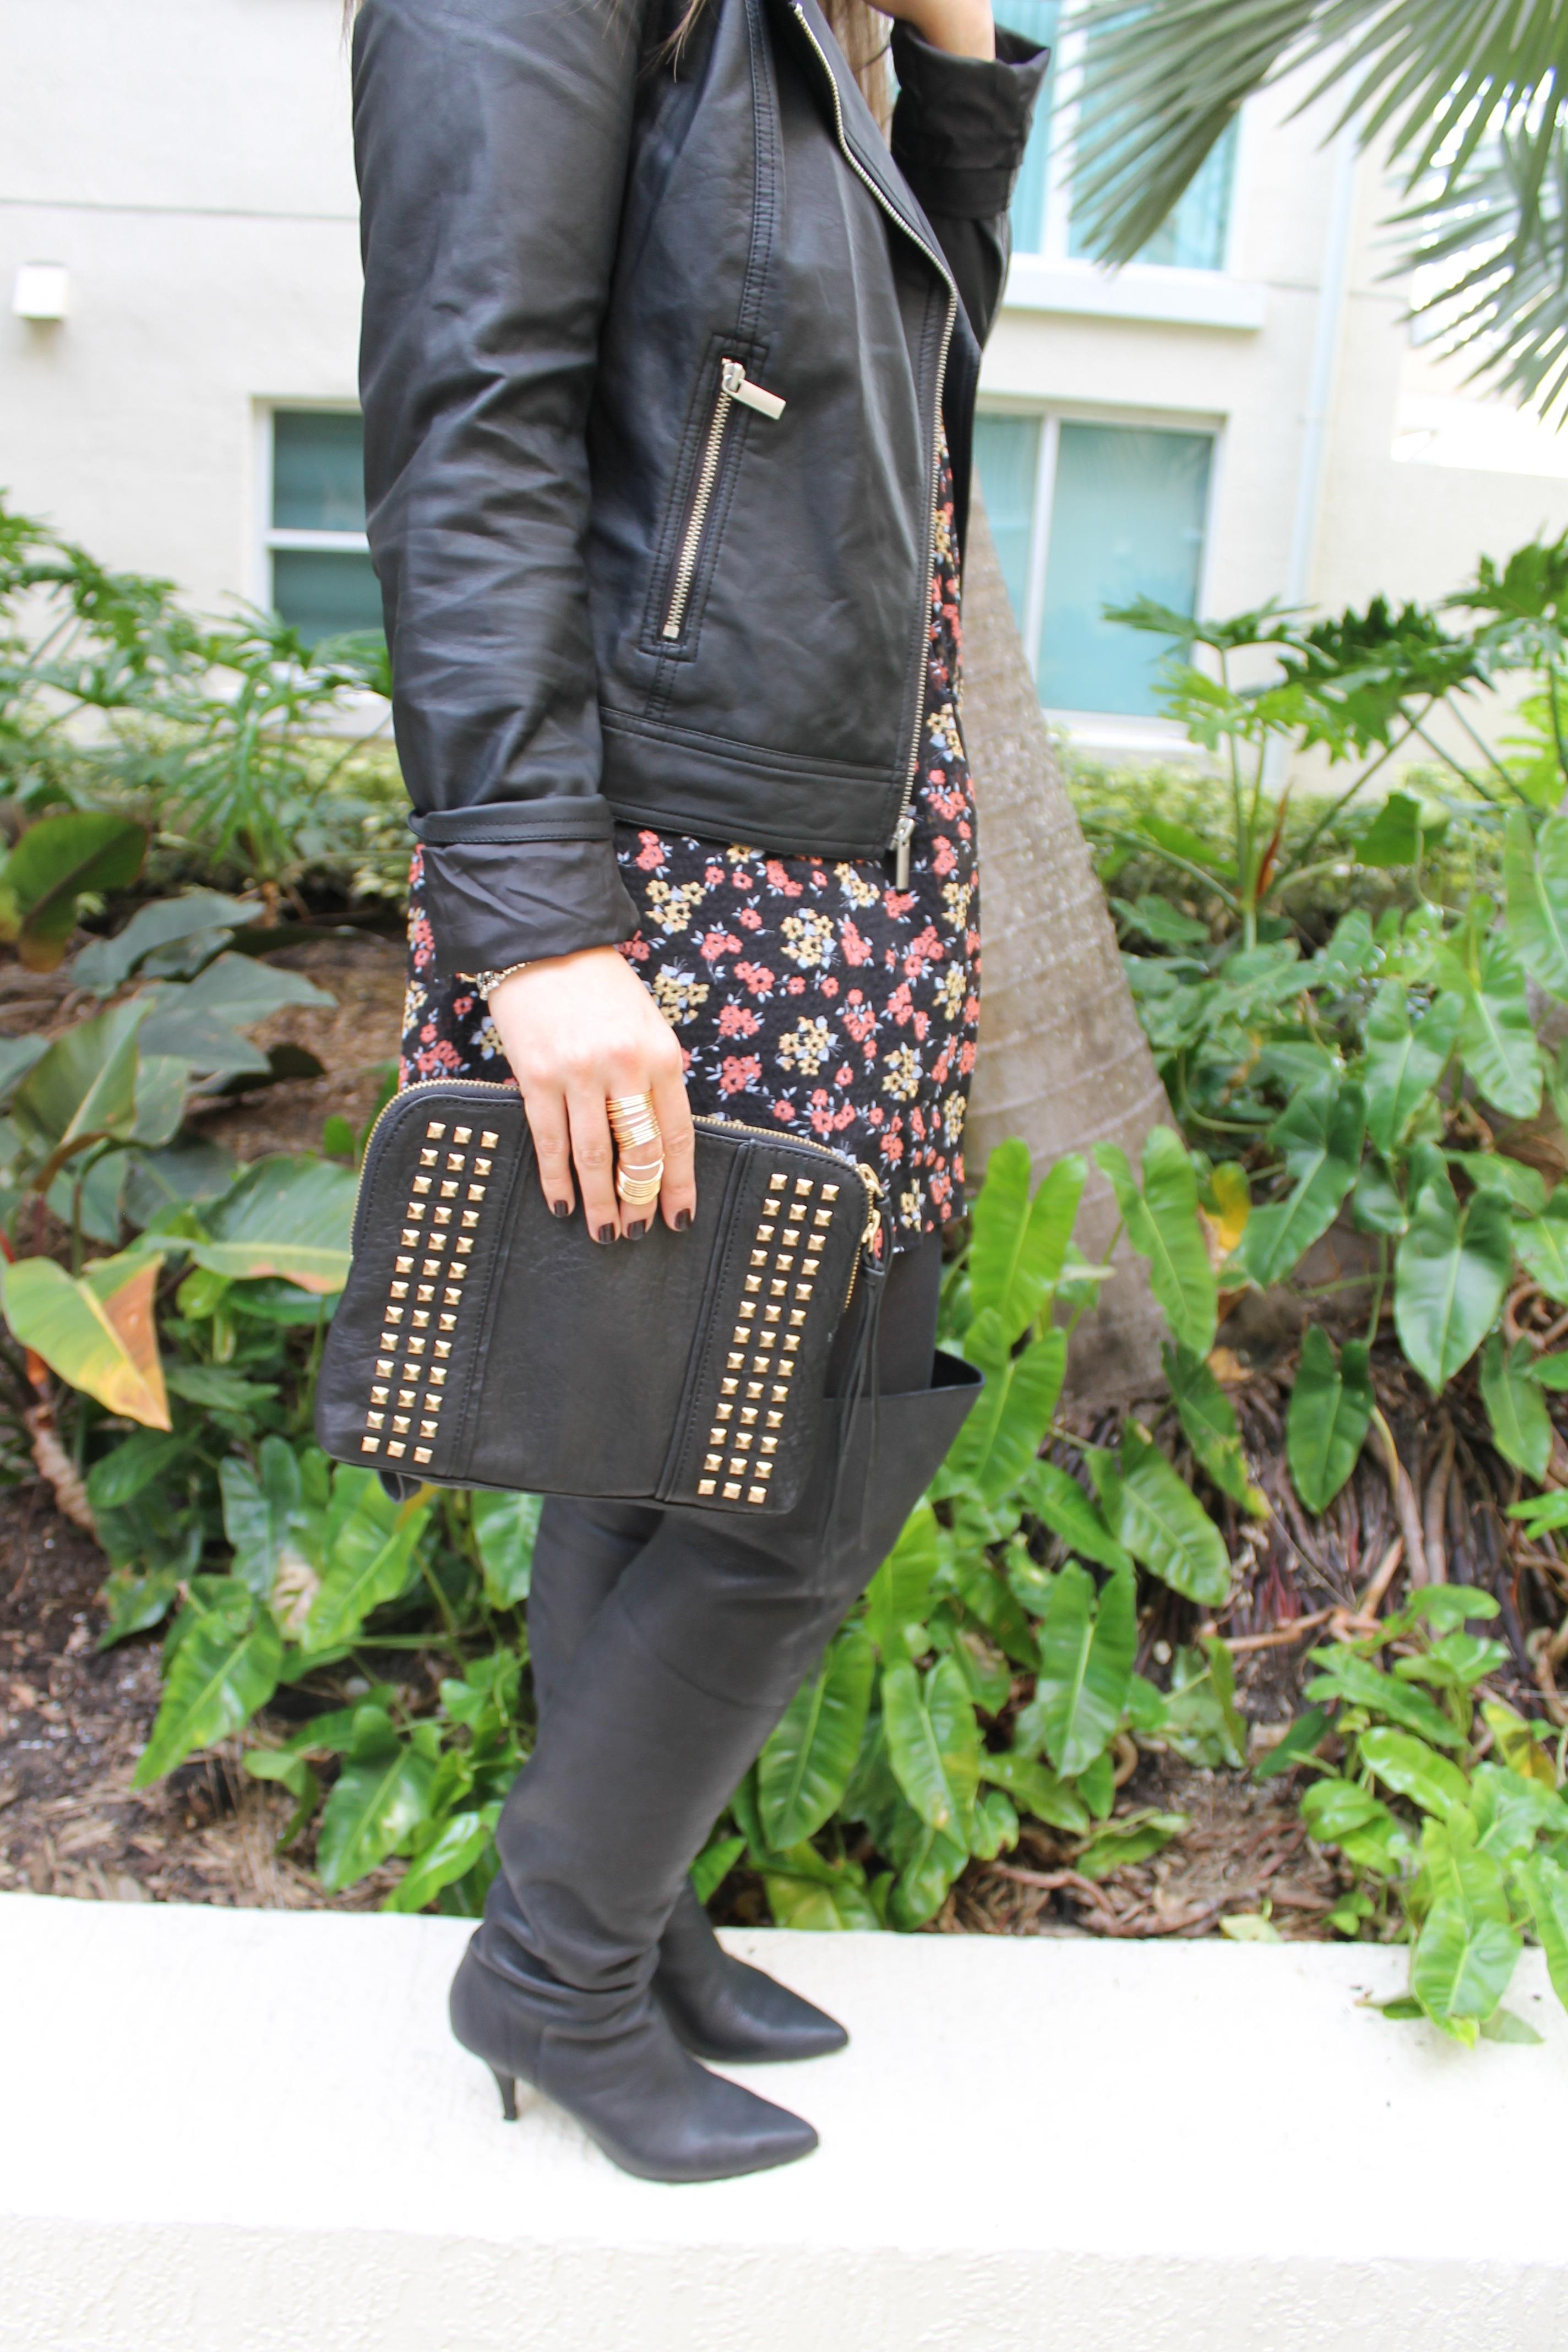 Xx: Shop Handbags, Shoes, Jewelry, Home Decor 16